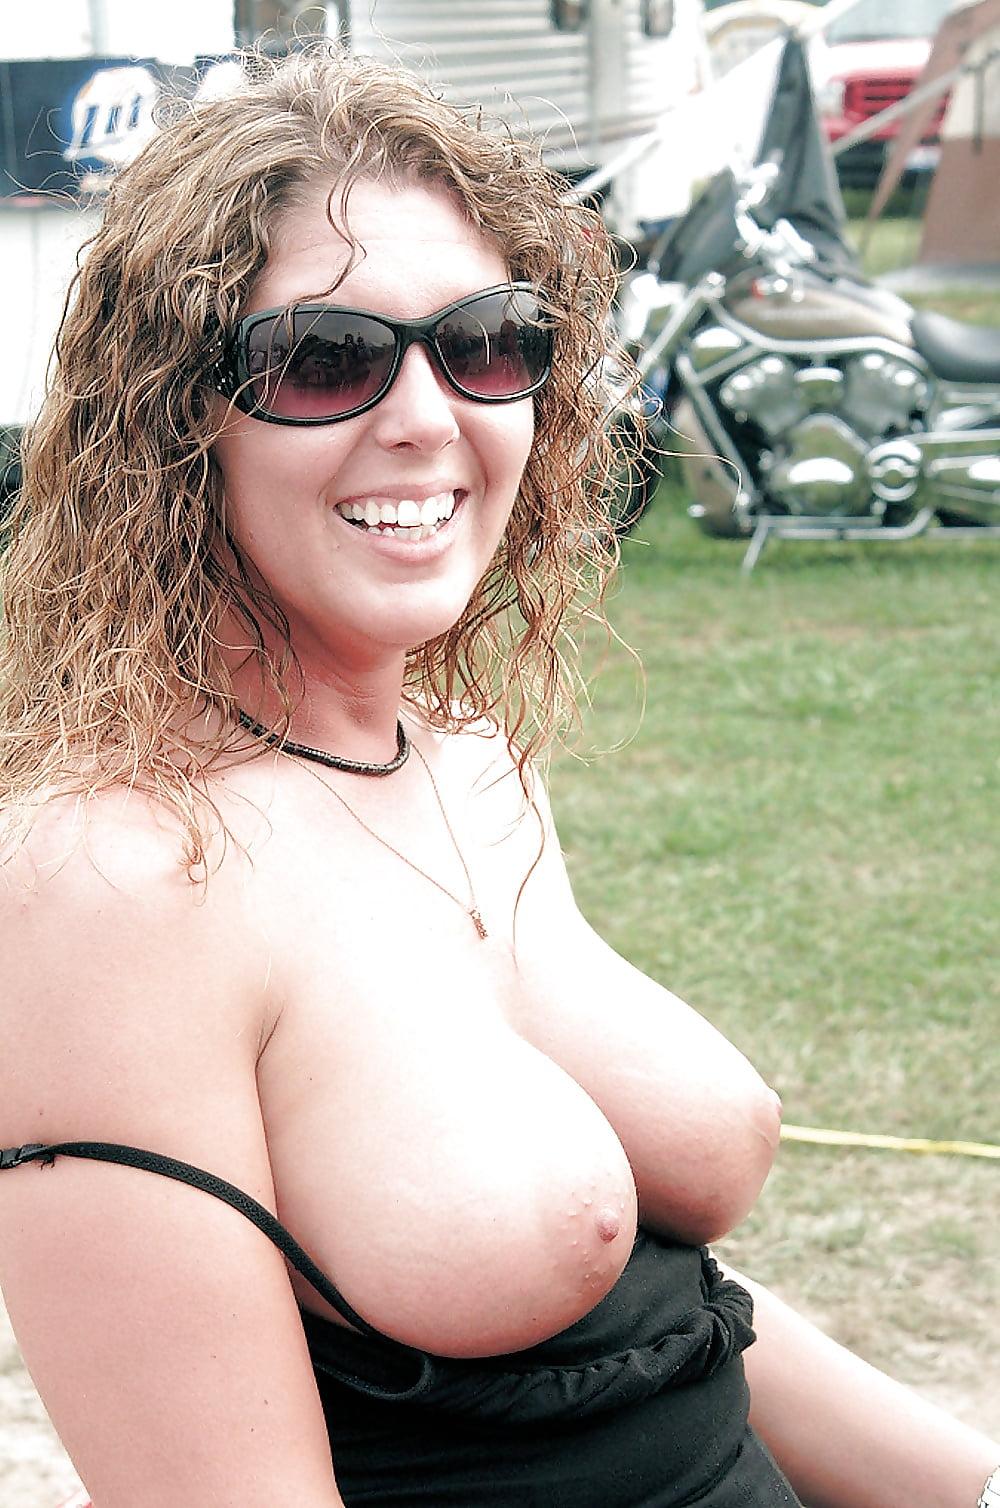 This horny trailer trash slut shows her stuff slut horny